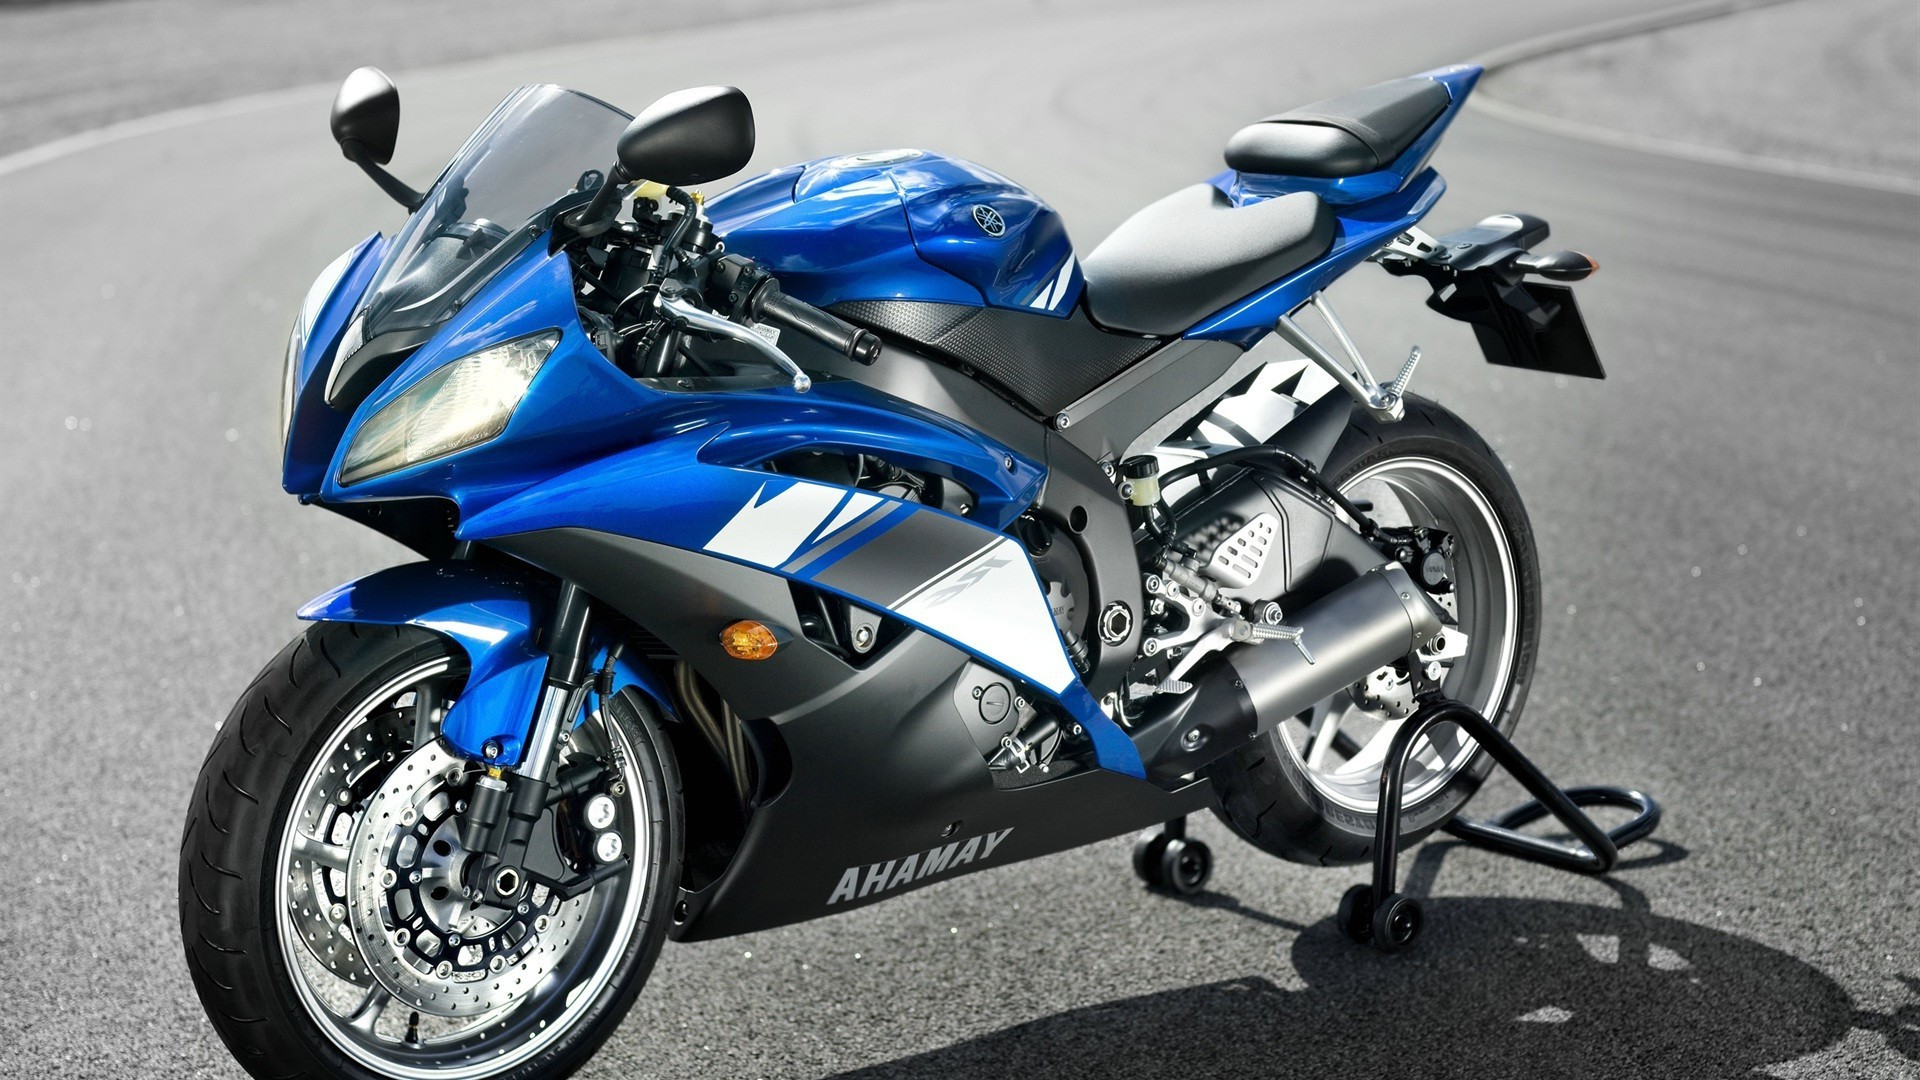 Sport Bike Bike Drive Vehicle Wheel Race Power Machine - Motorcycle - HD Wallpaper